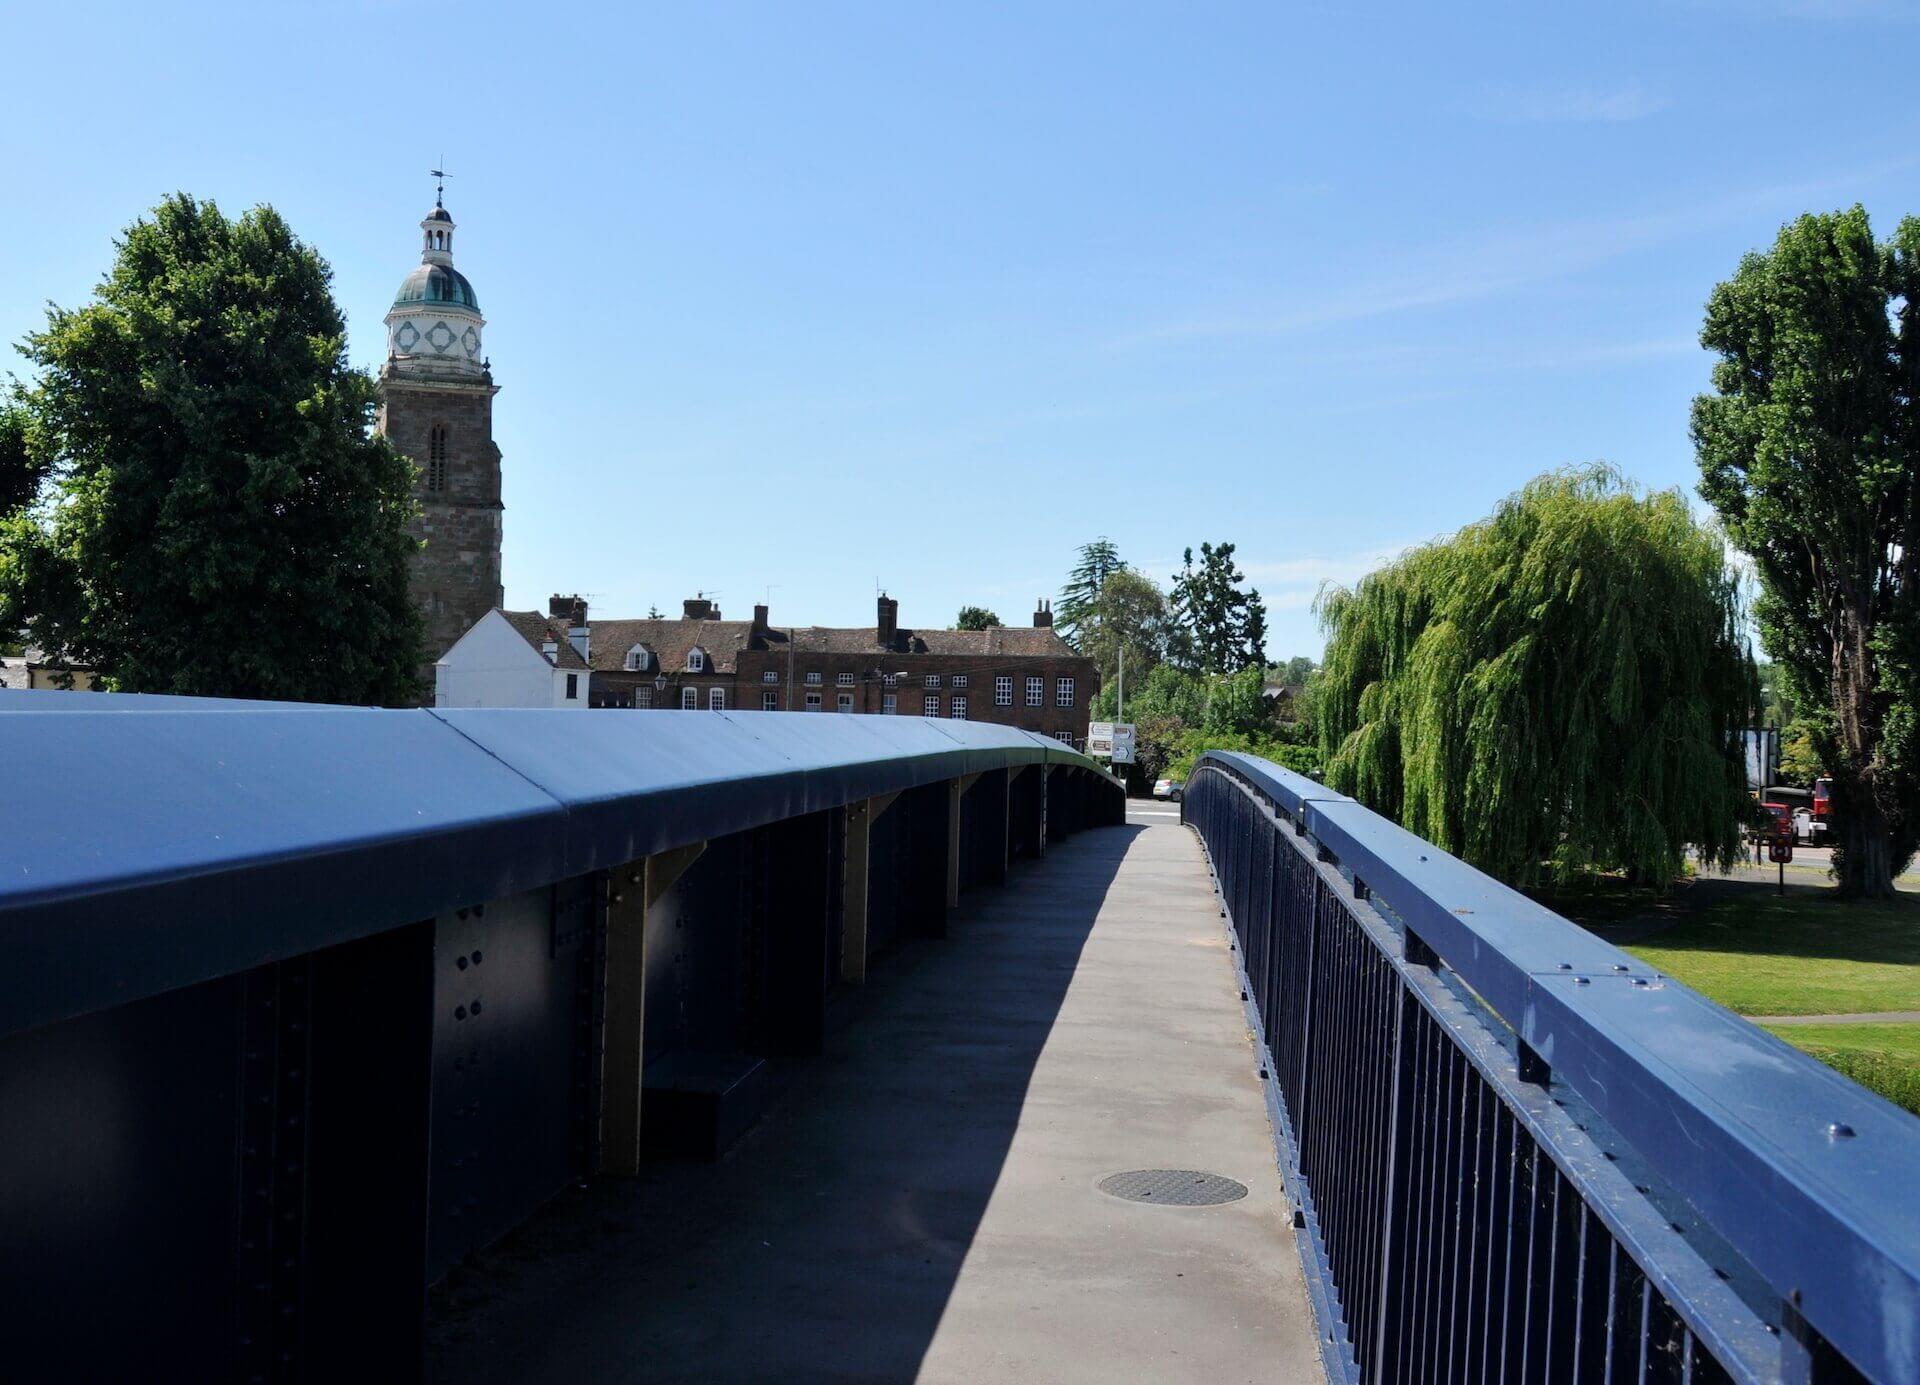 Upton Bridge